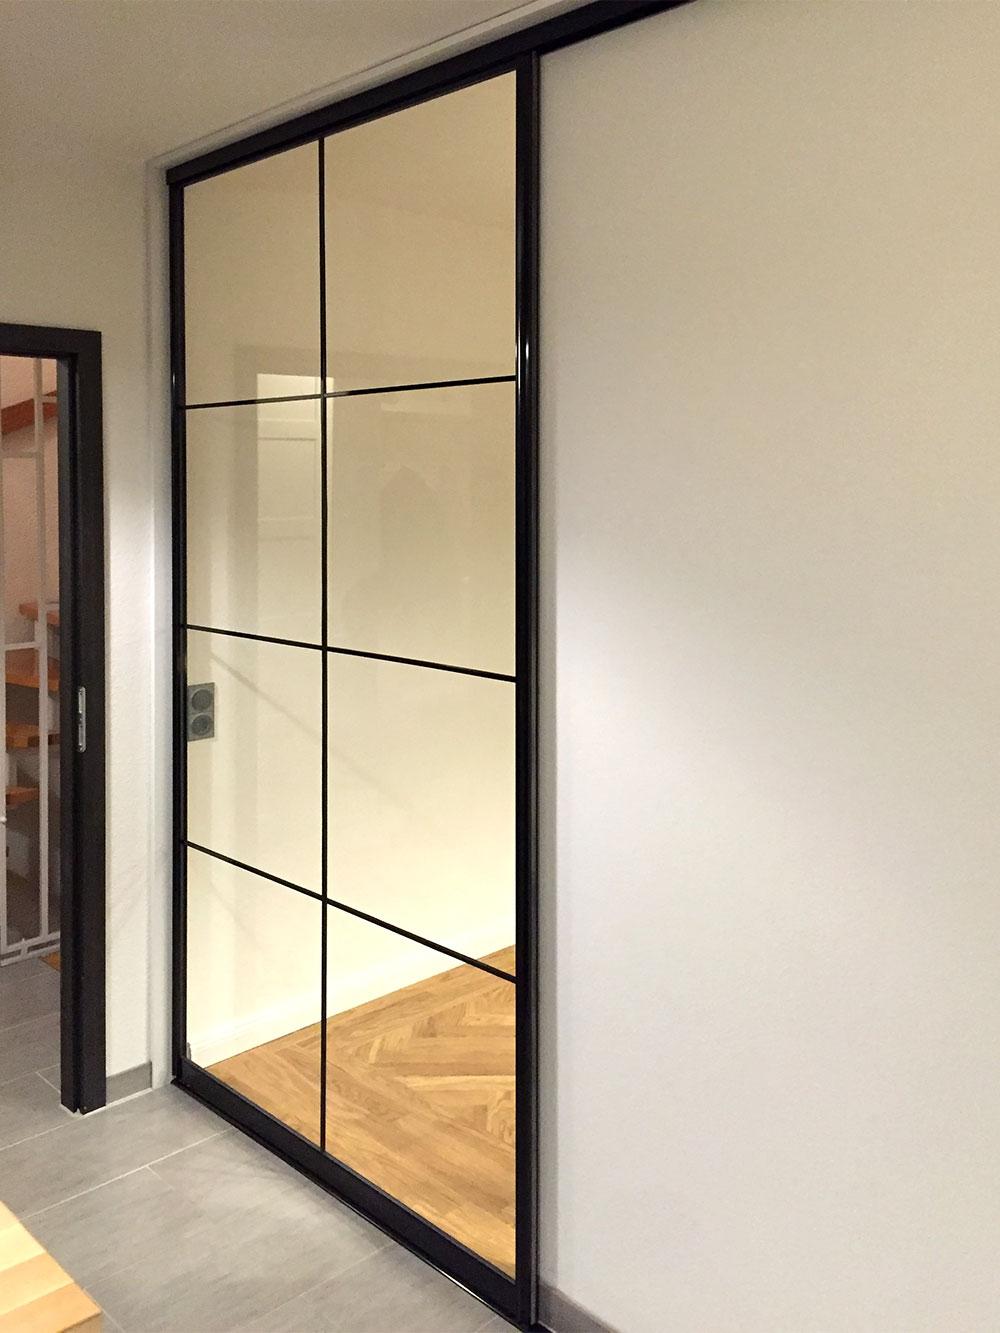 referenzen raumteiler schiebet ren als raumteiler. Black Bedroom Furniture Sets. Home Design Ideas